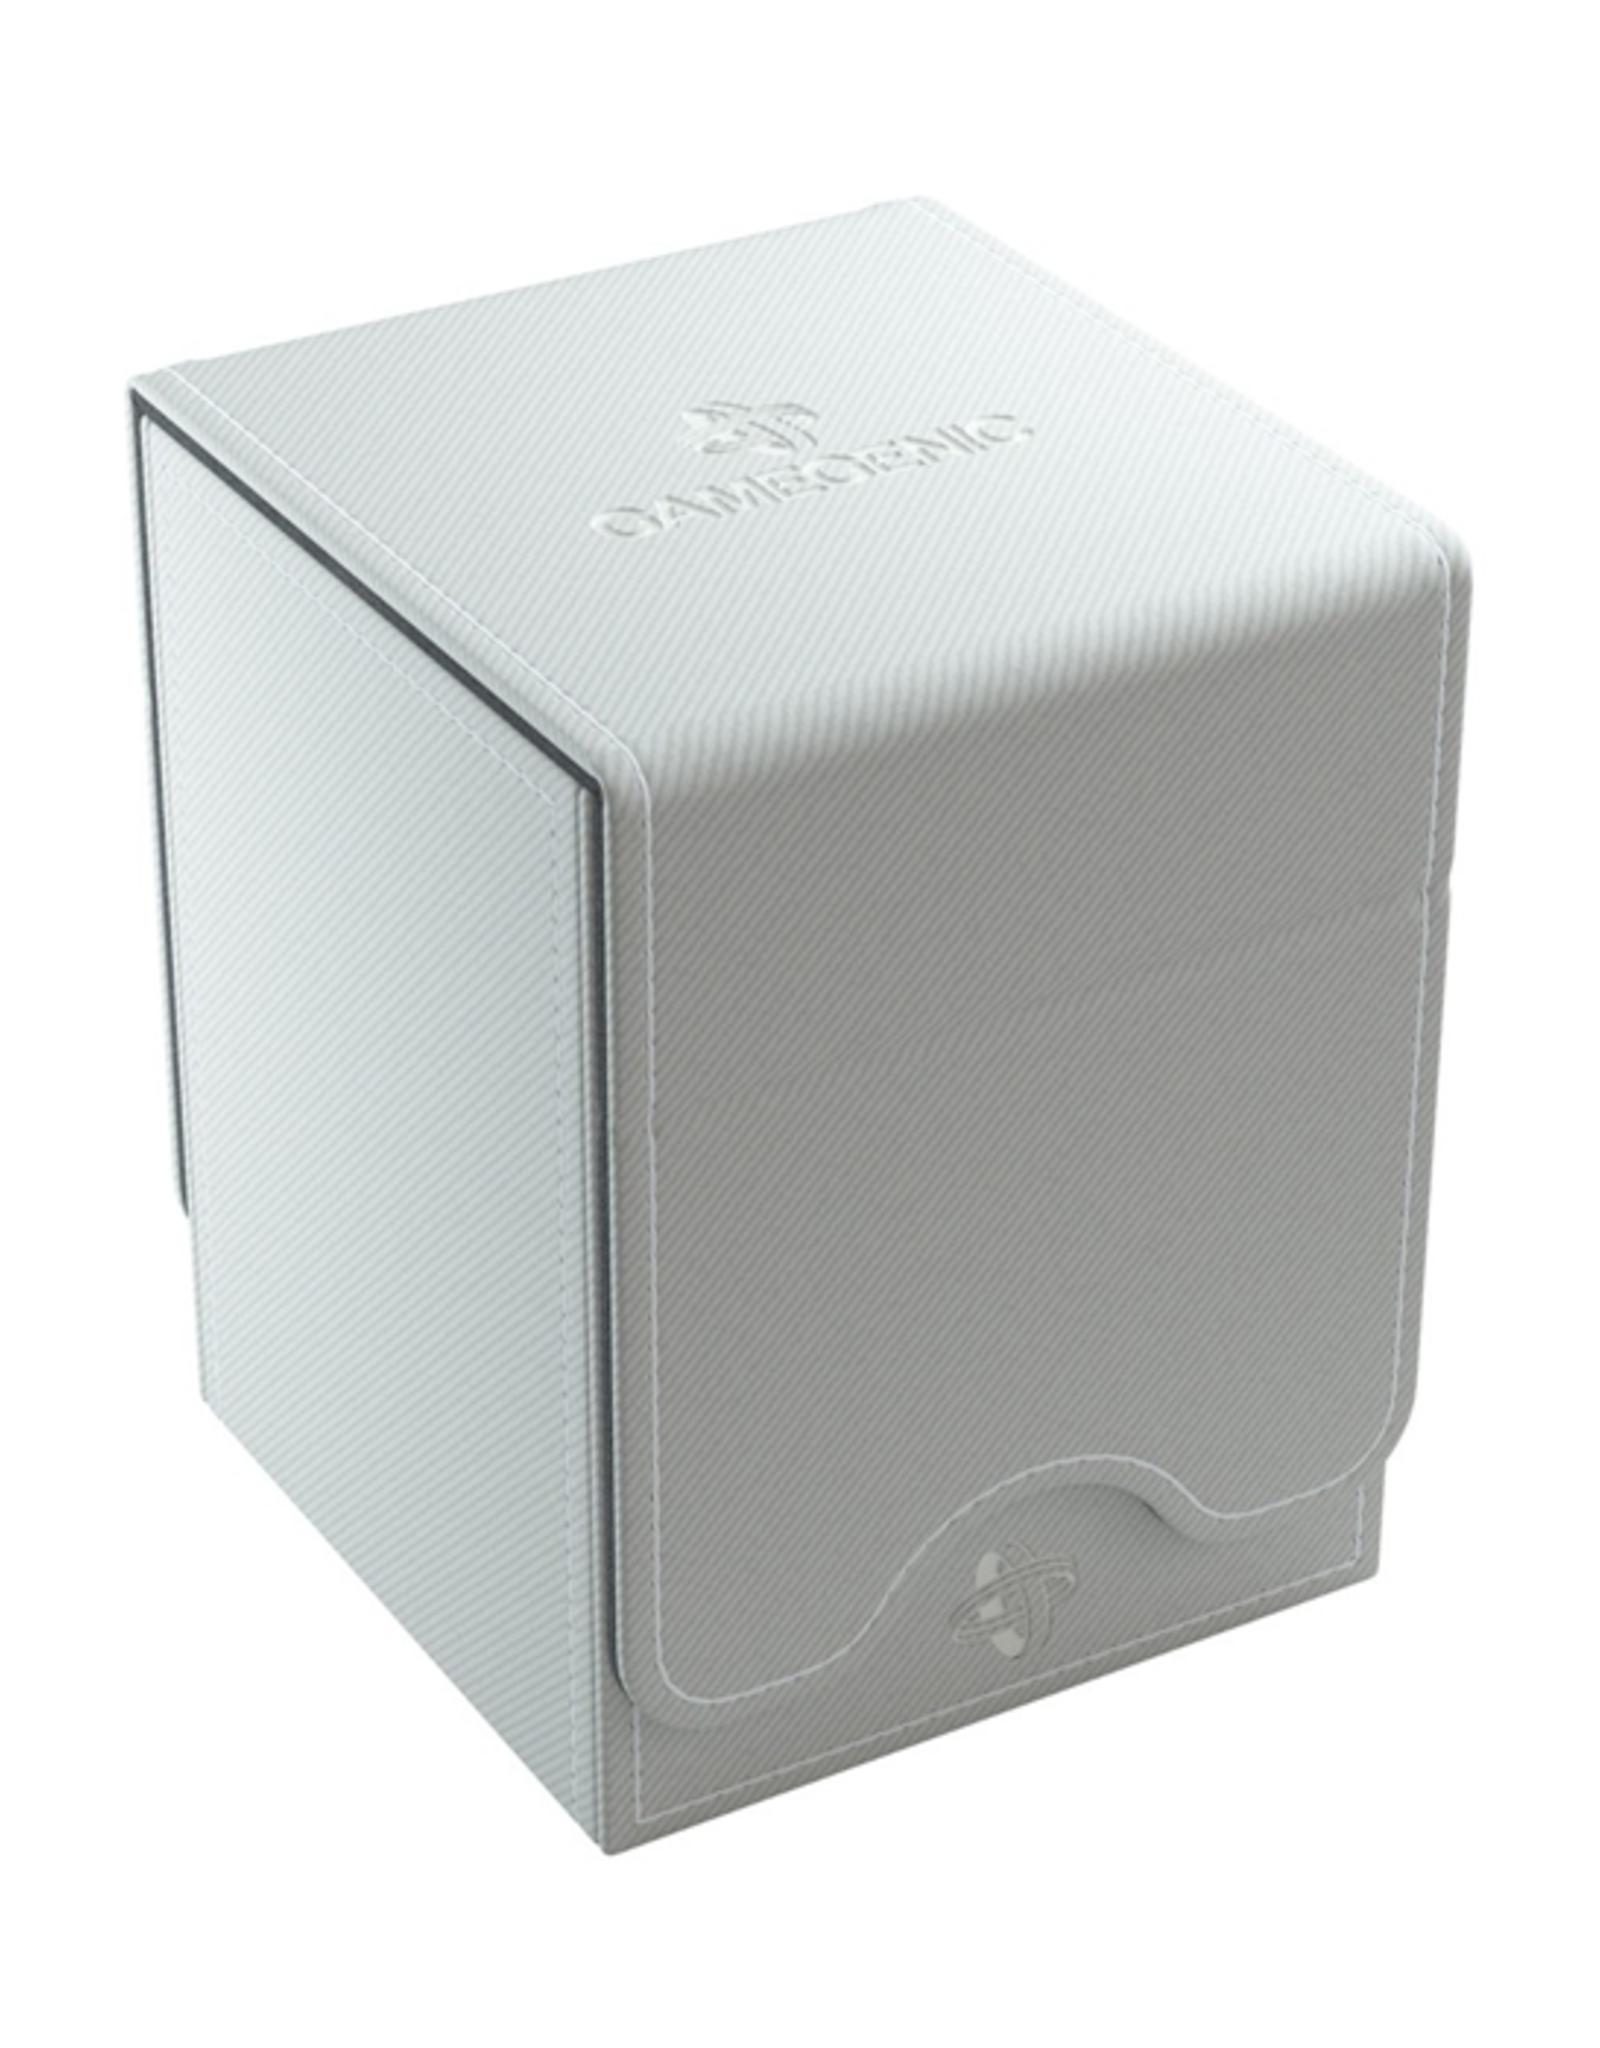 Gamegenic Gamegenic: Deck Box - Squire 100+ - White